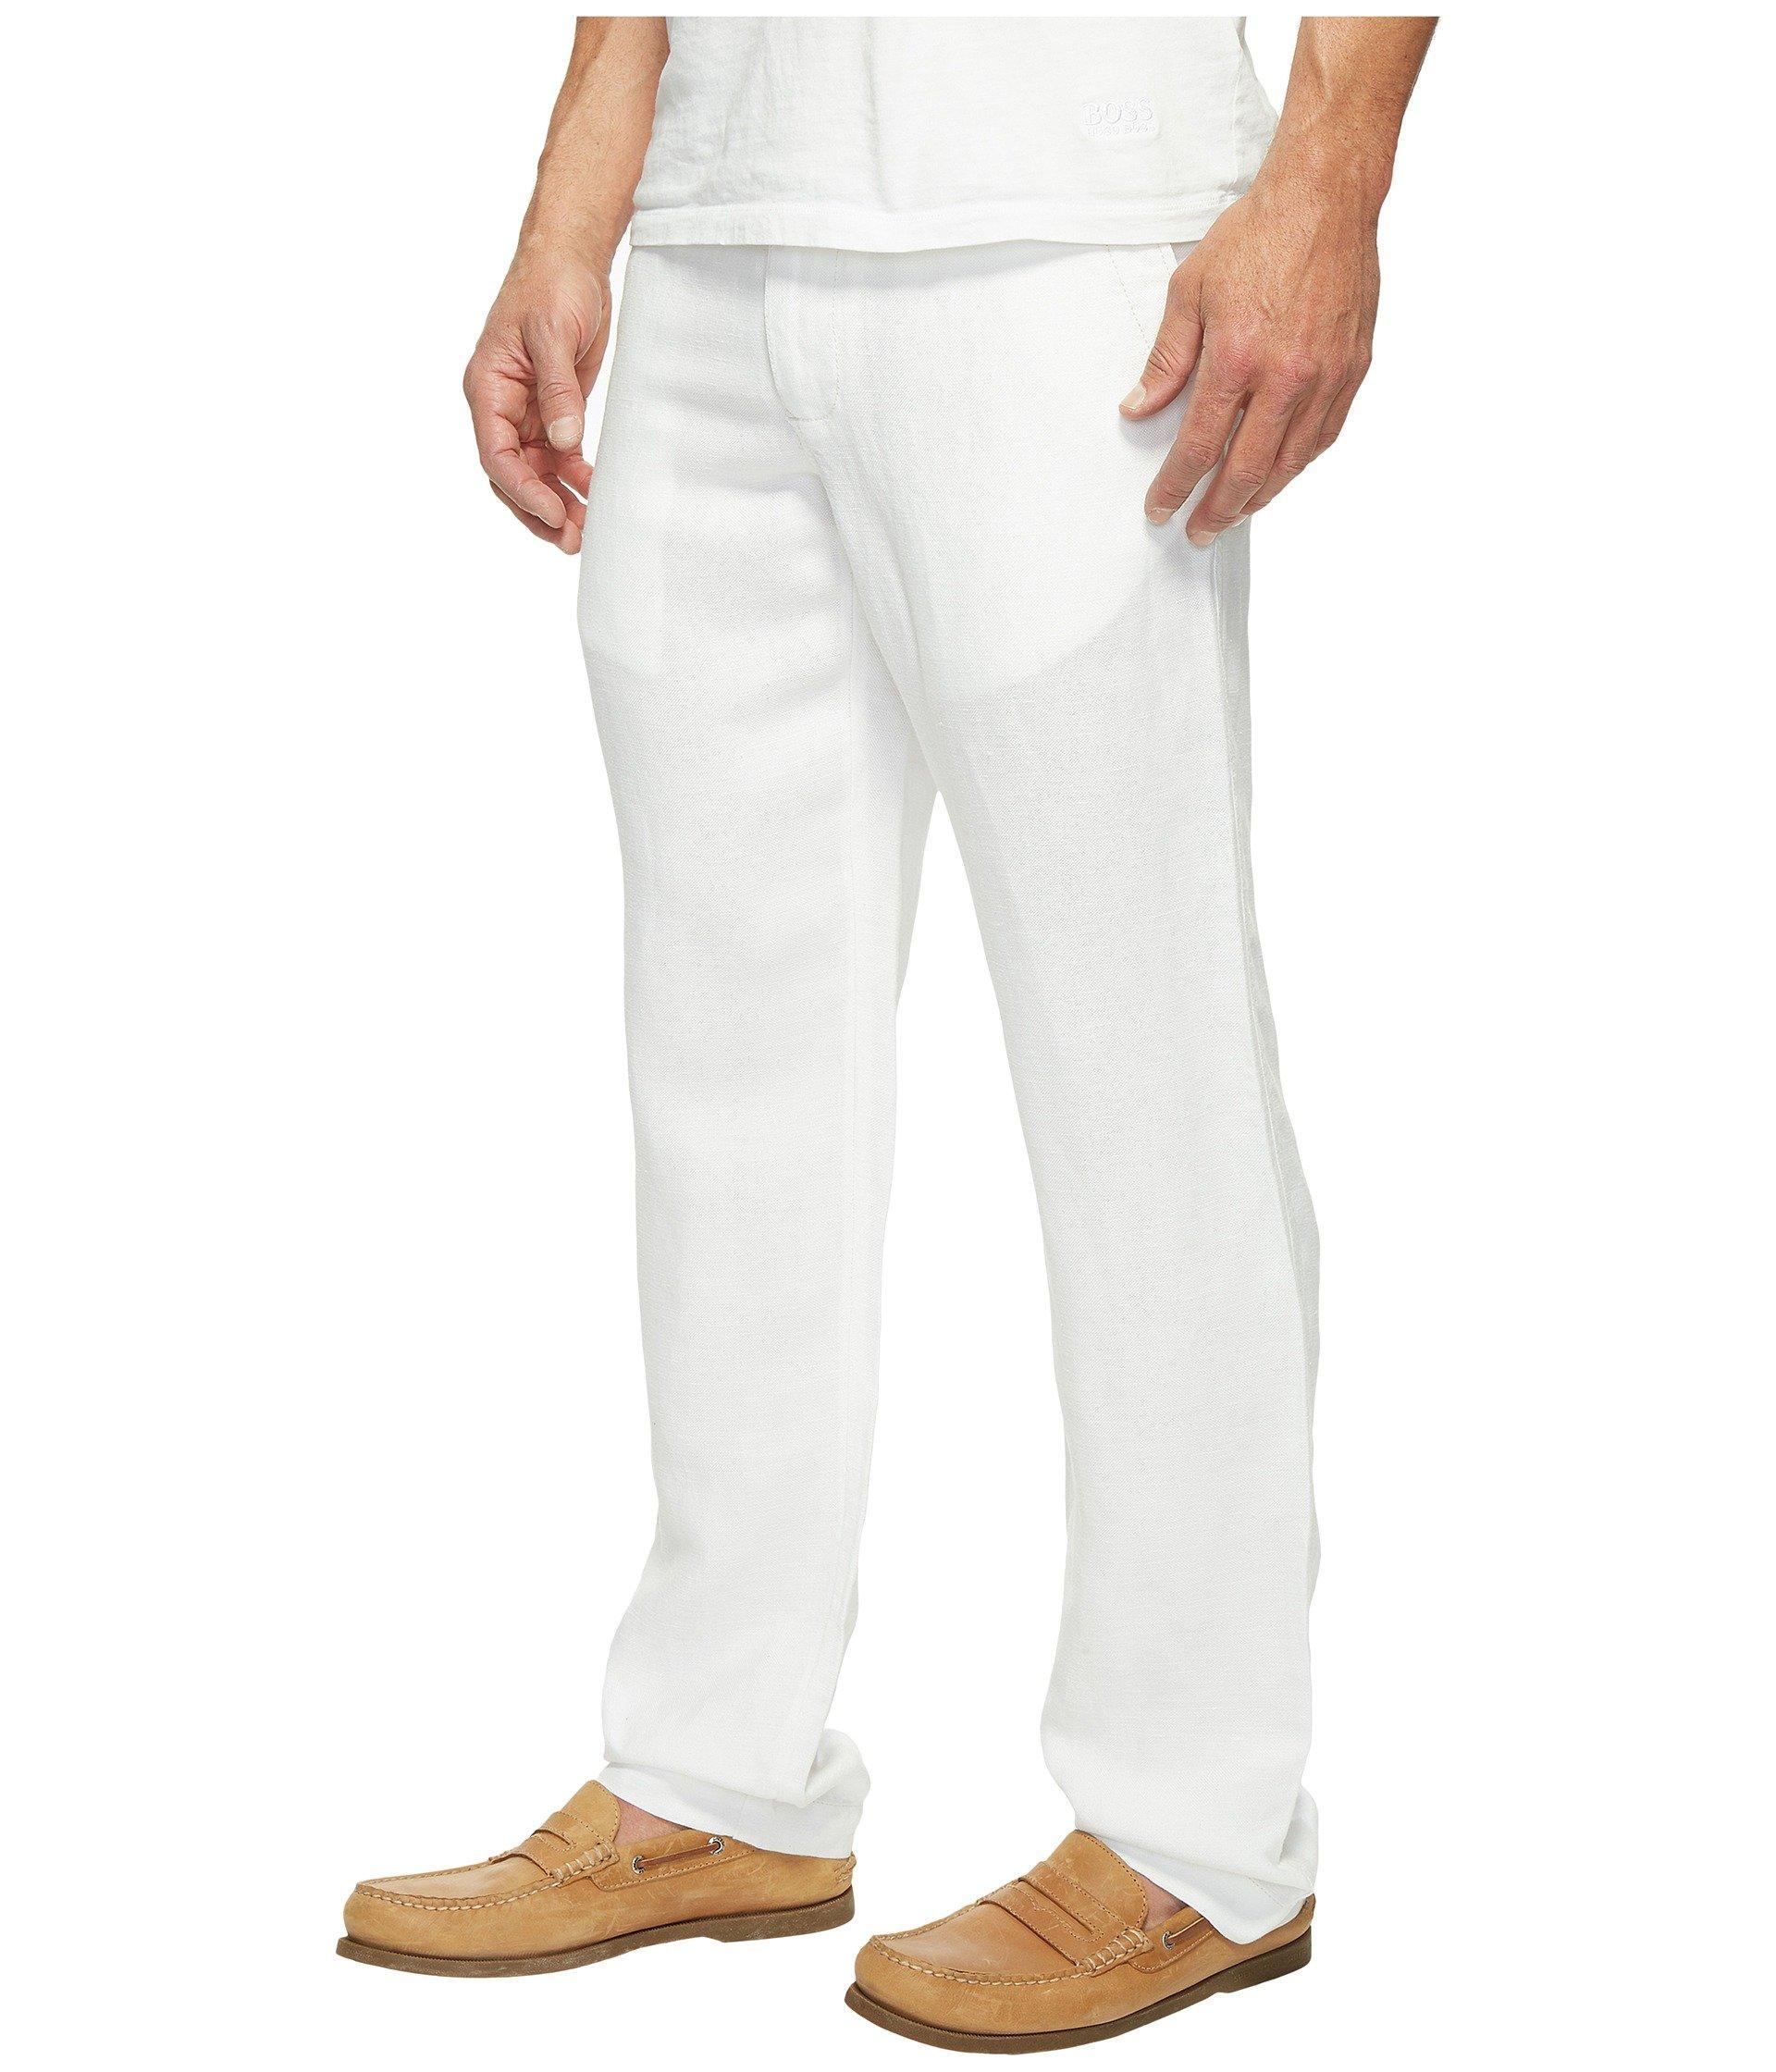 d7f5de1e2b Lyst - Tommy Bahama Linen The Dream Pants in White for Men - Save 34%